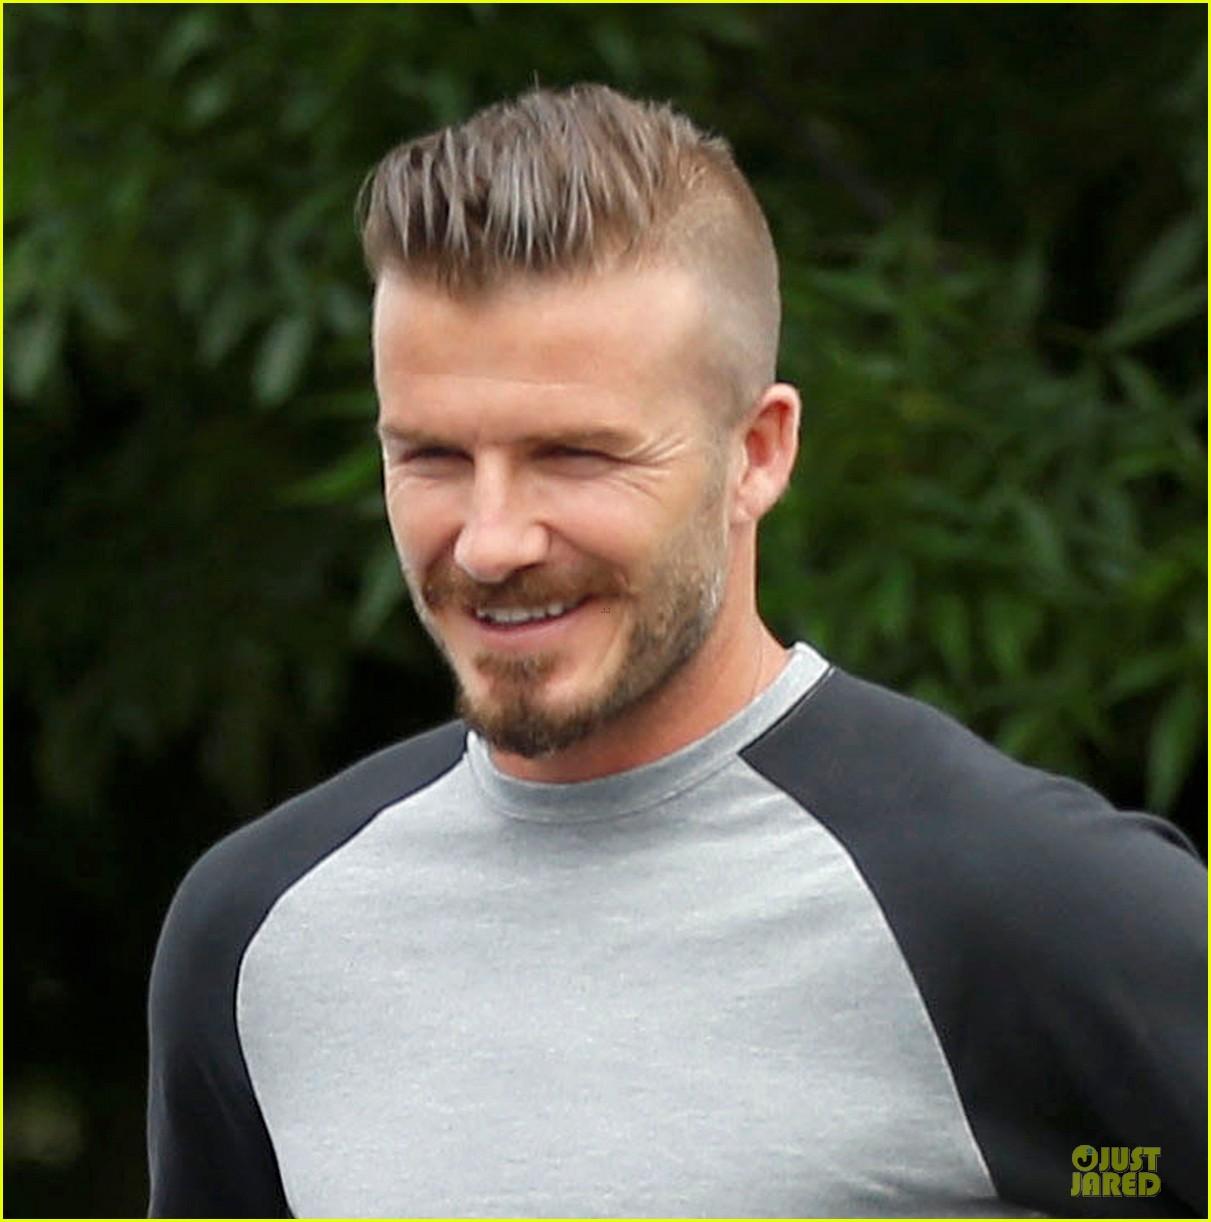 David Beckham Hairstyles 2013 Photos David Beckham